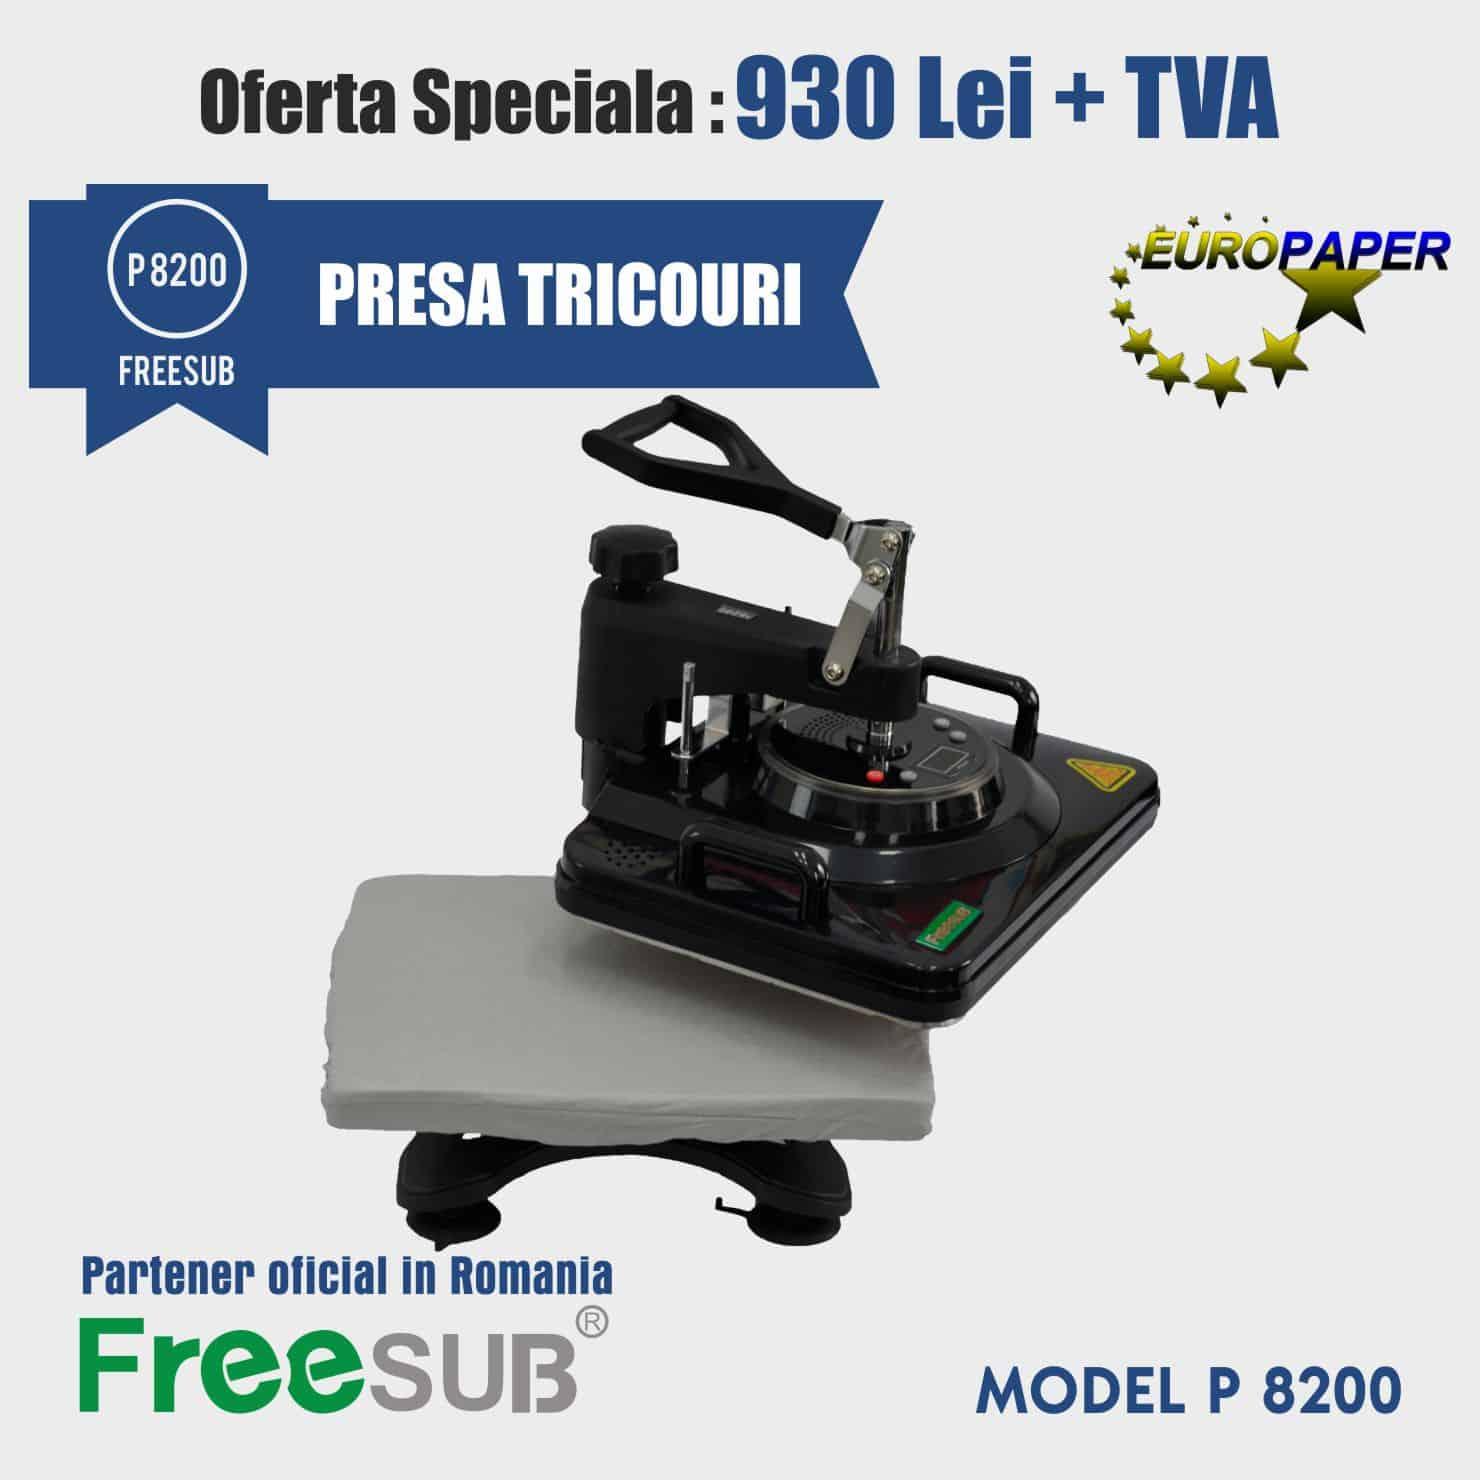 FREESUB P8200